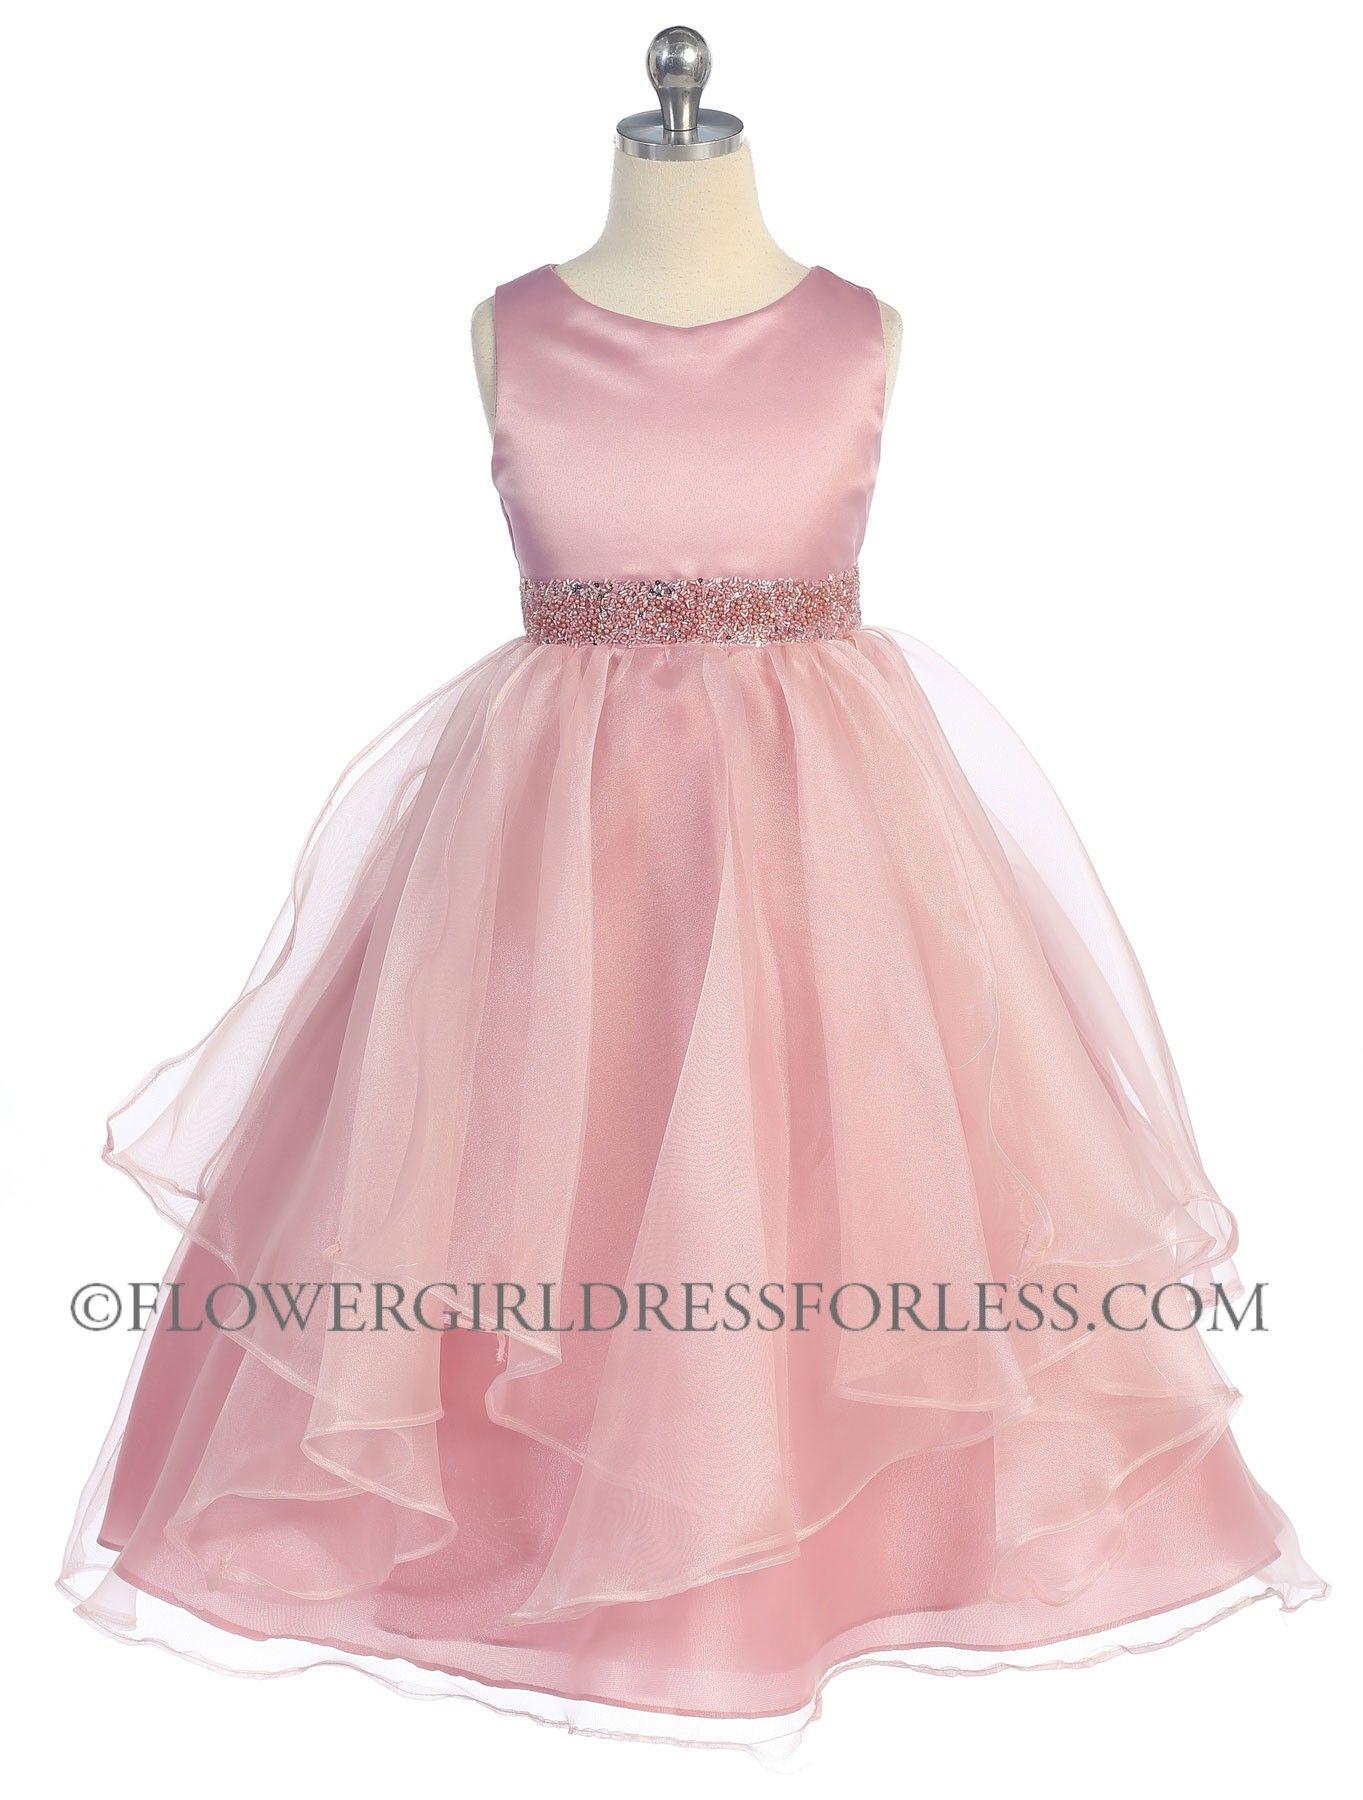 Girls dress style rose sleeveless satin and organza layered